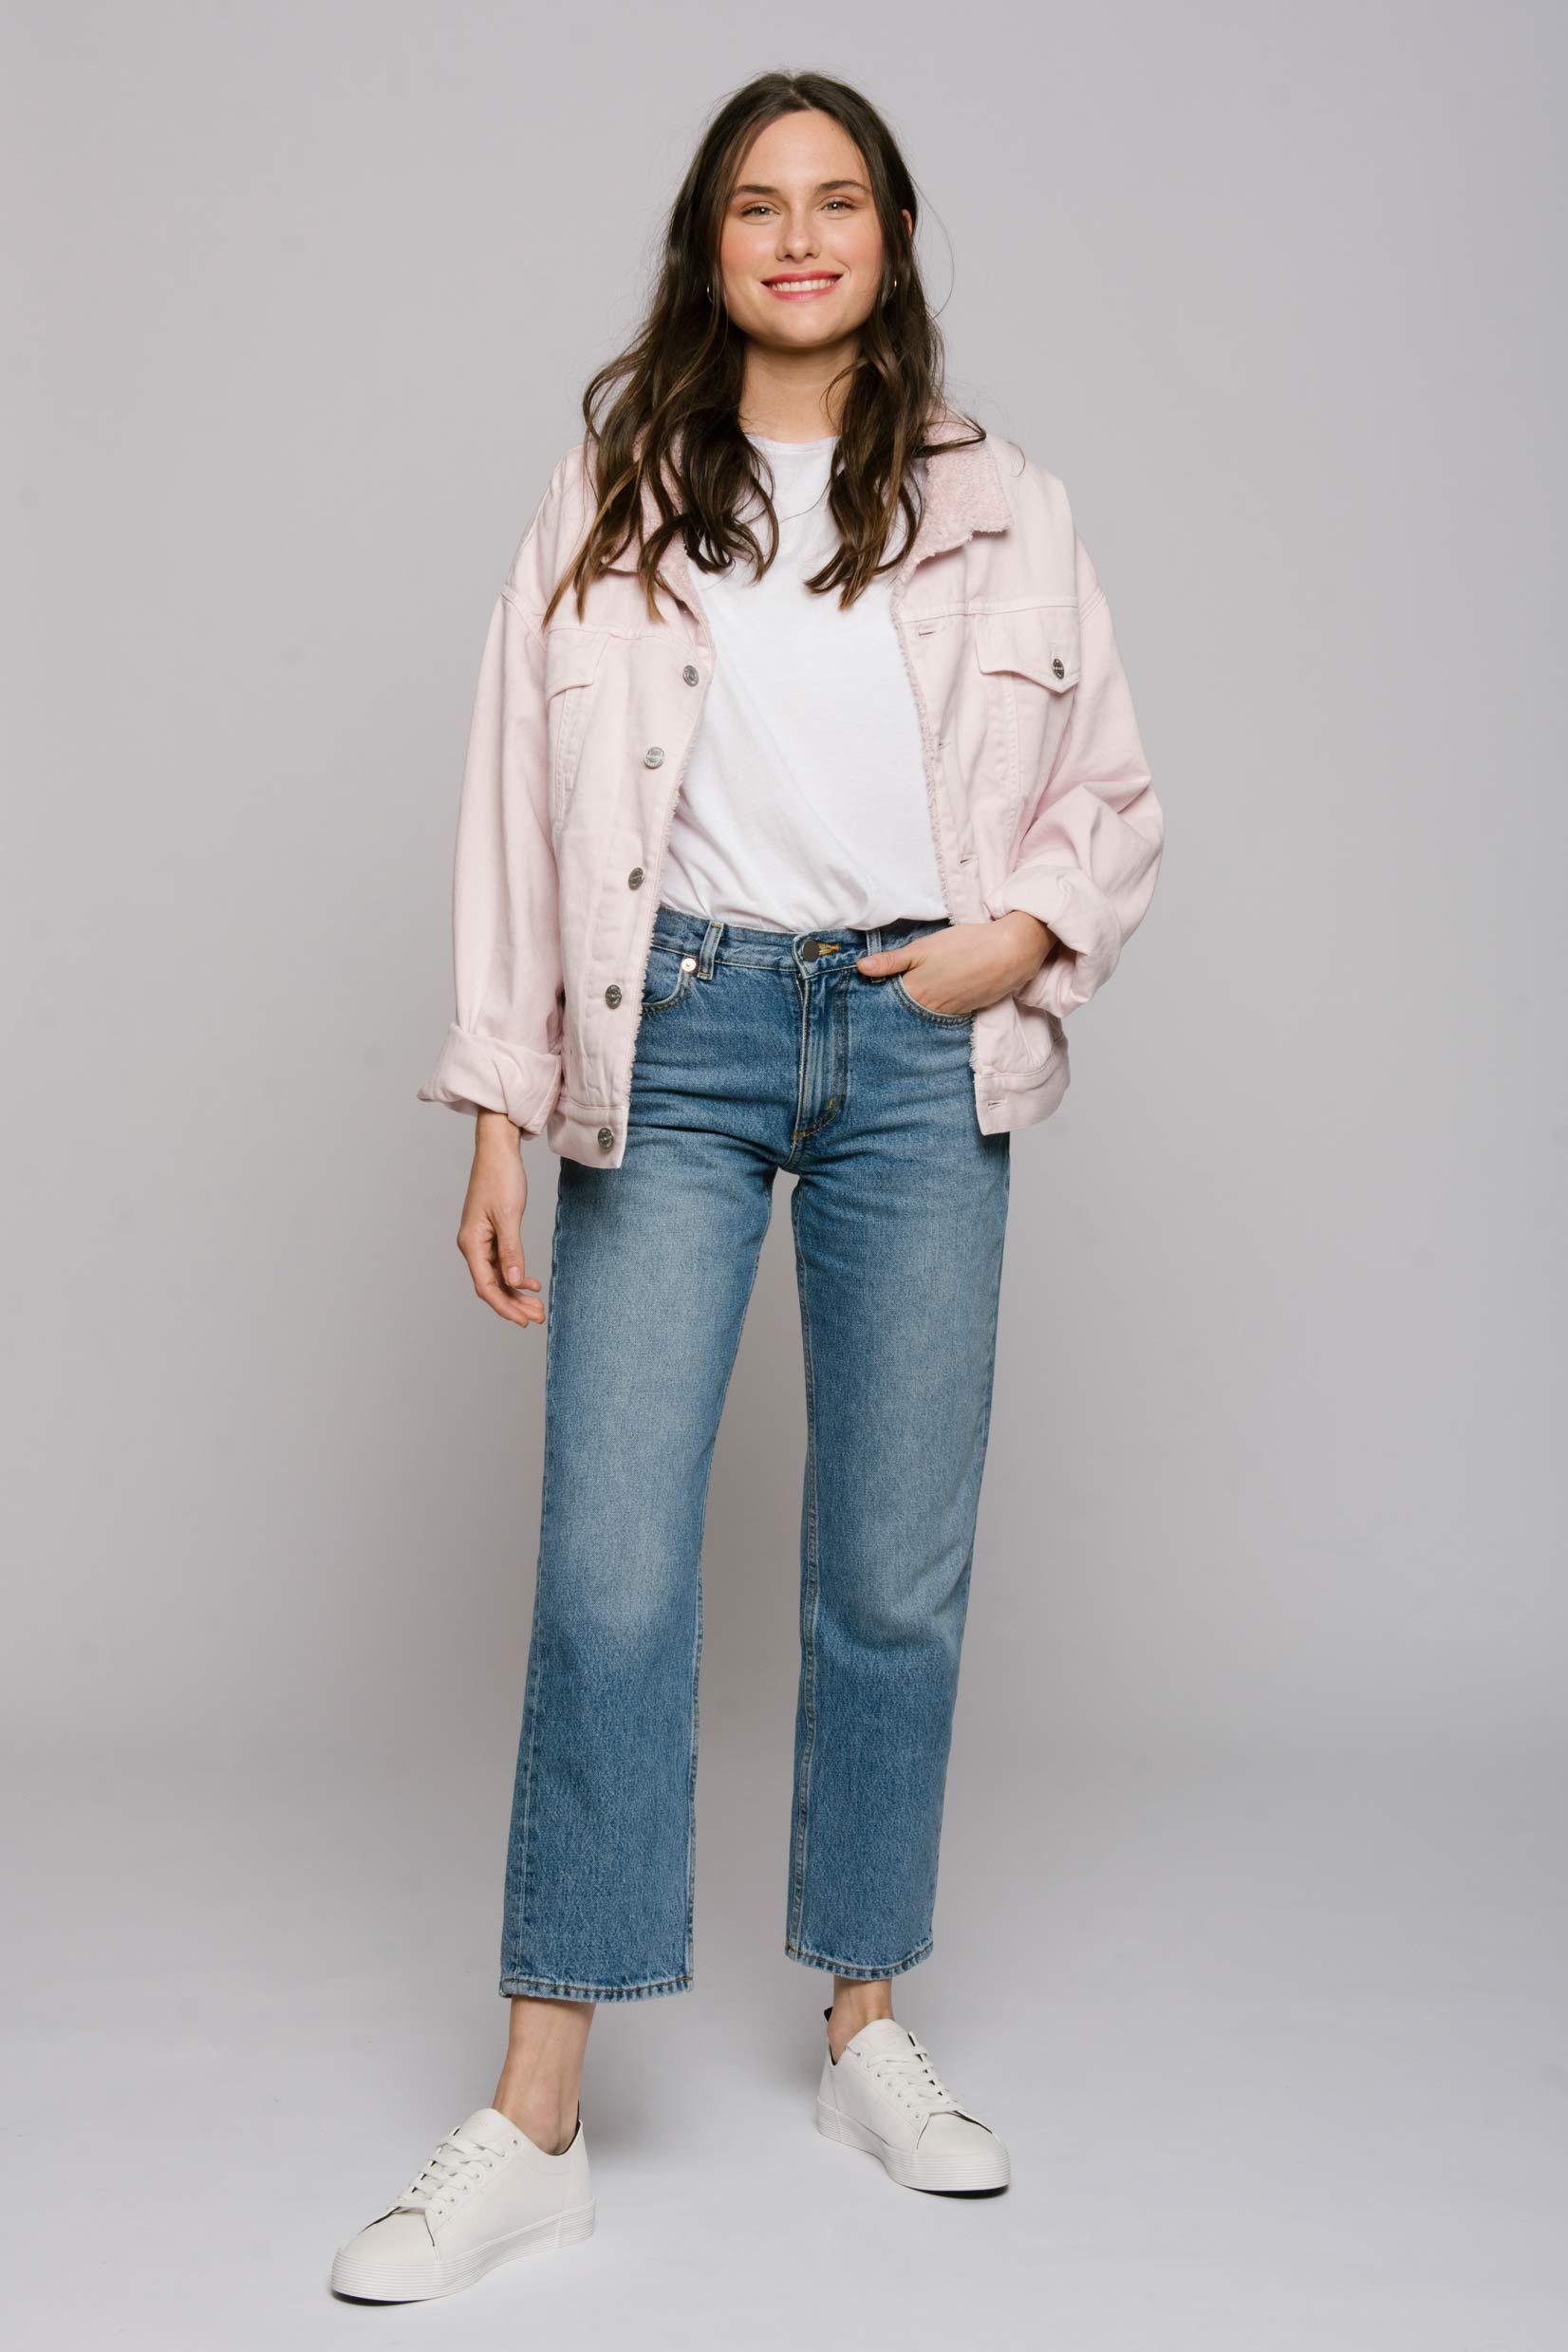 The Perfect Pink | Oversized denim jacket, Pink denim jacket